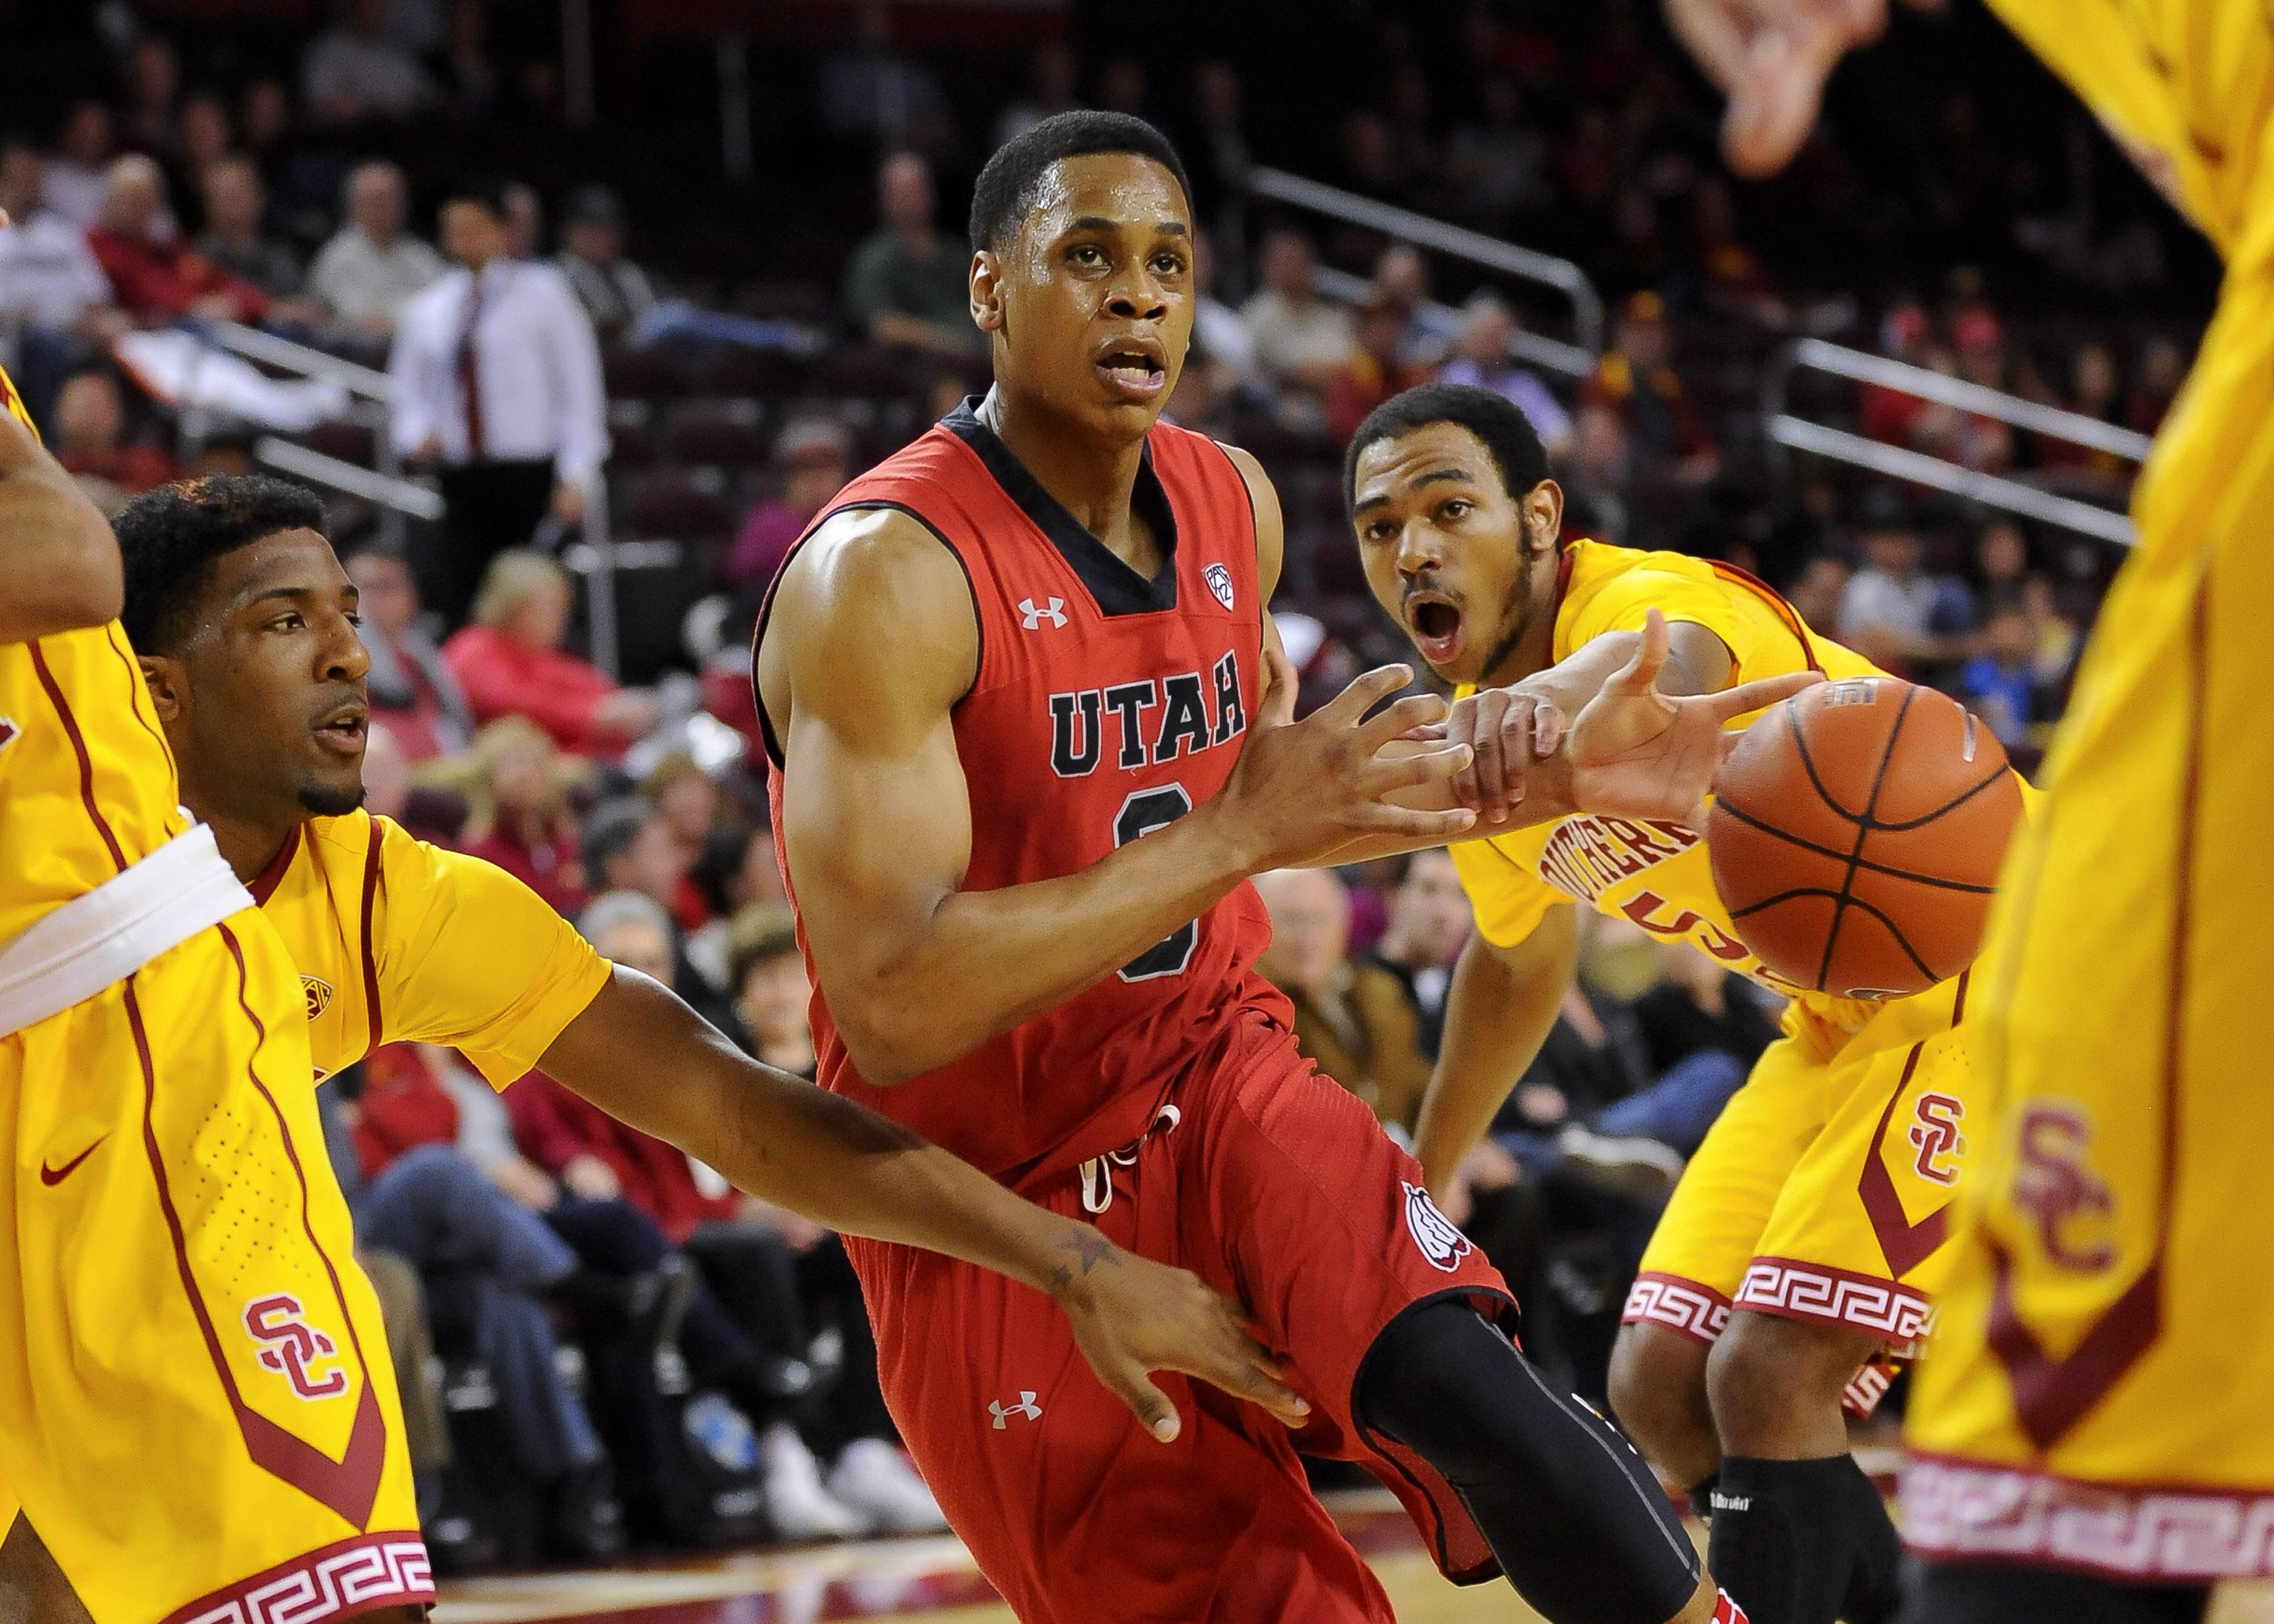 Utah holds off late run, beats USC 79-71